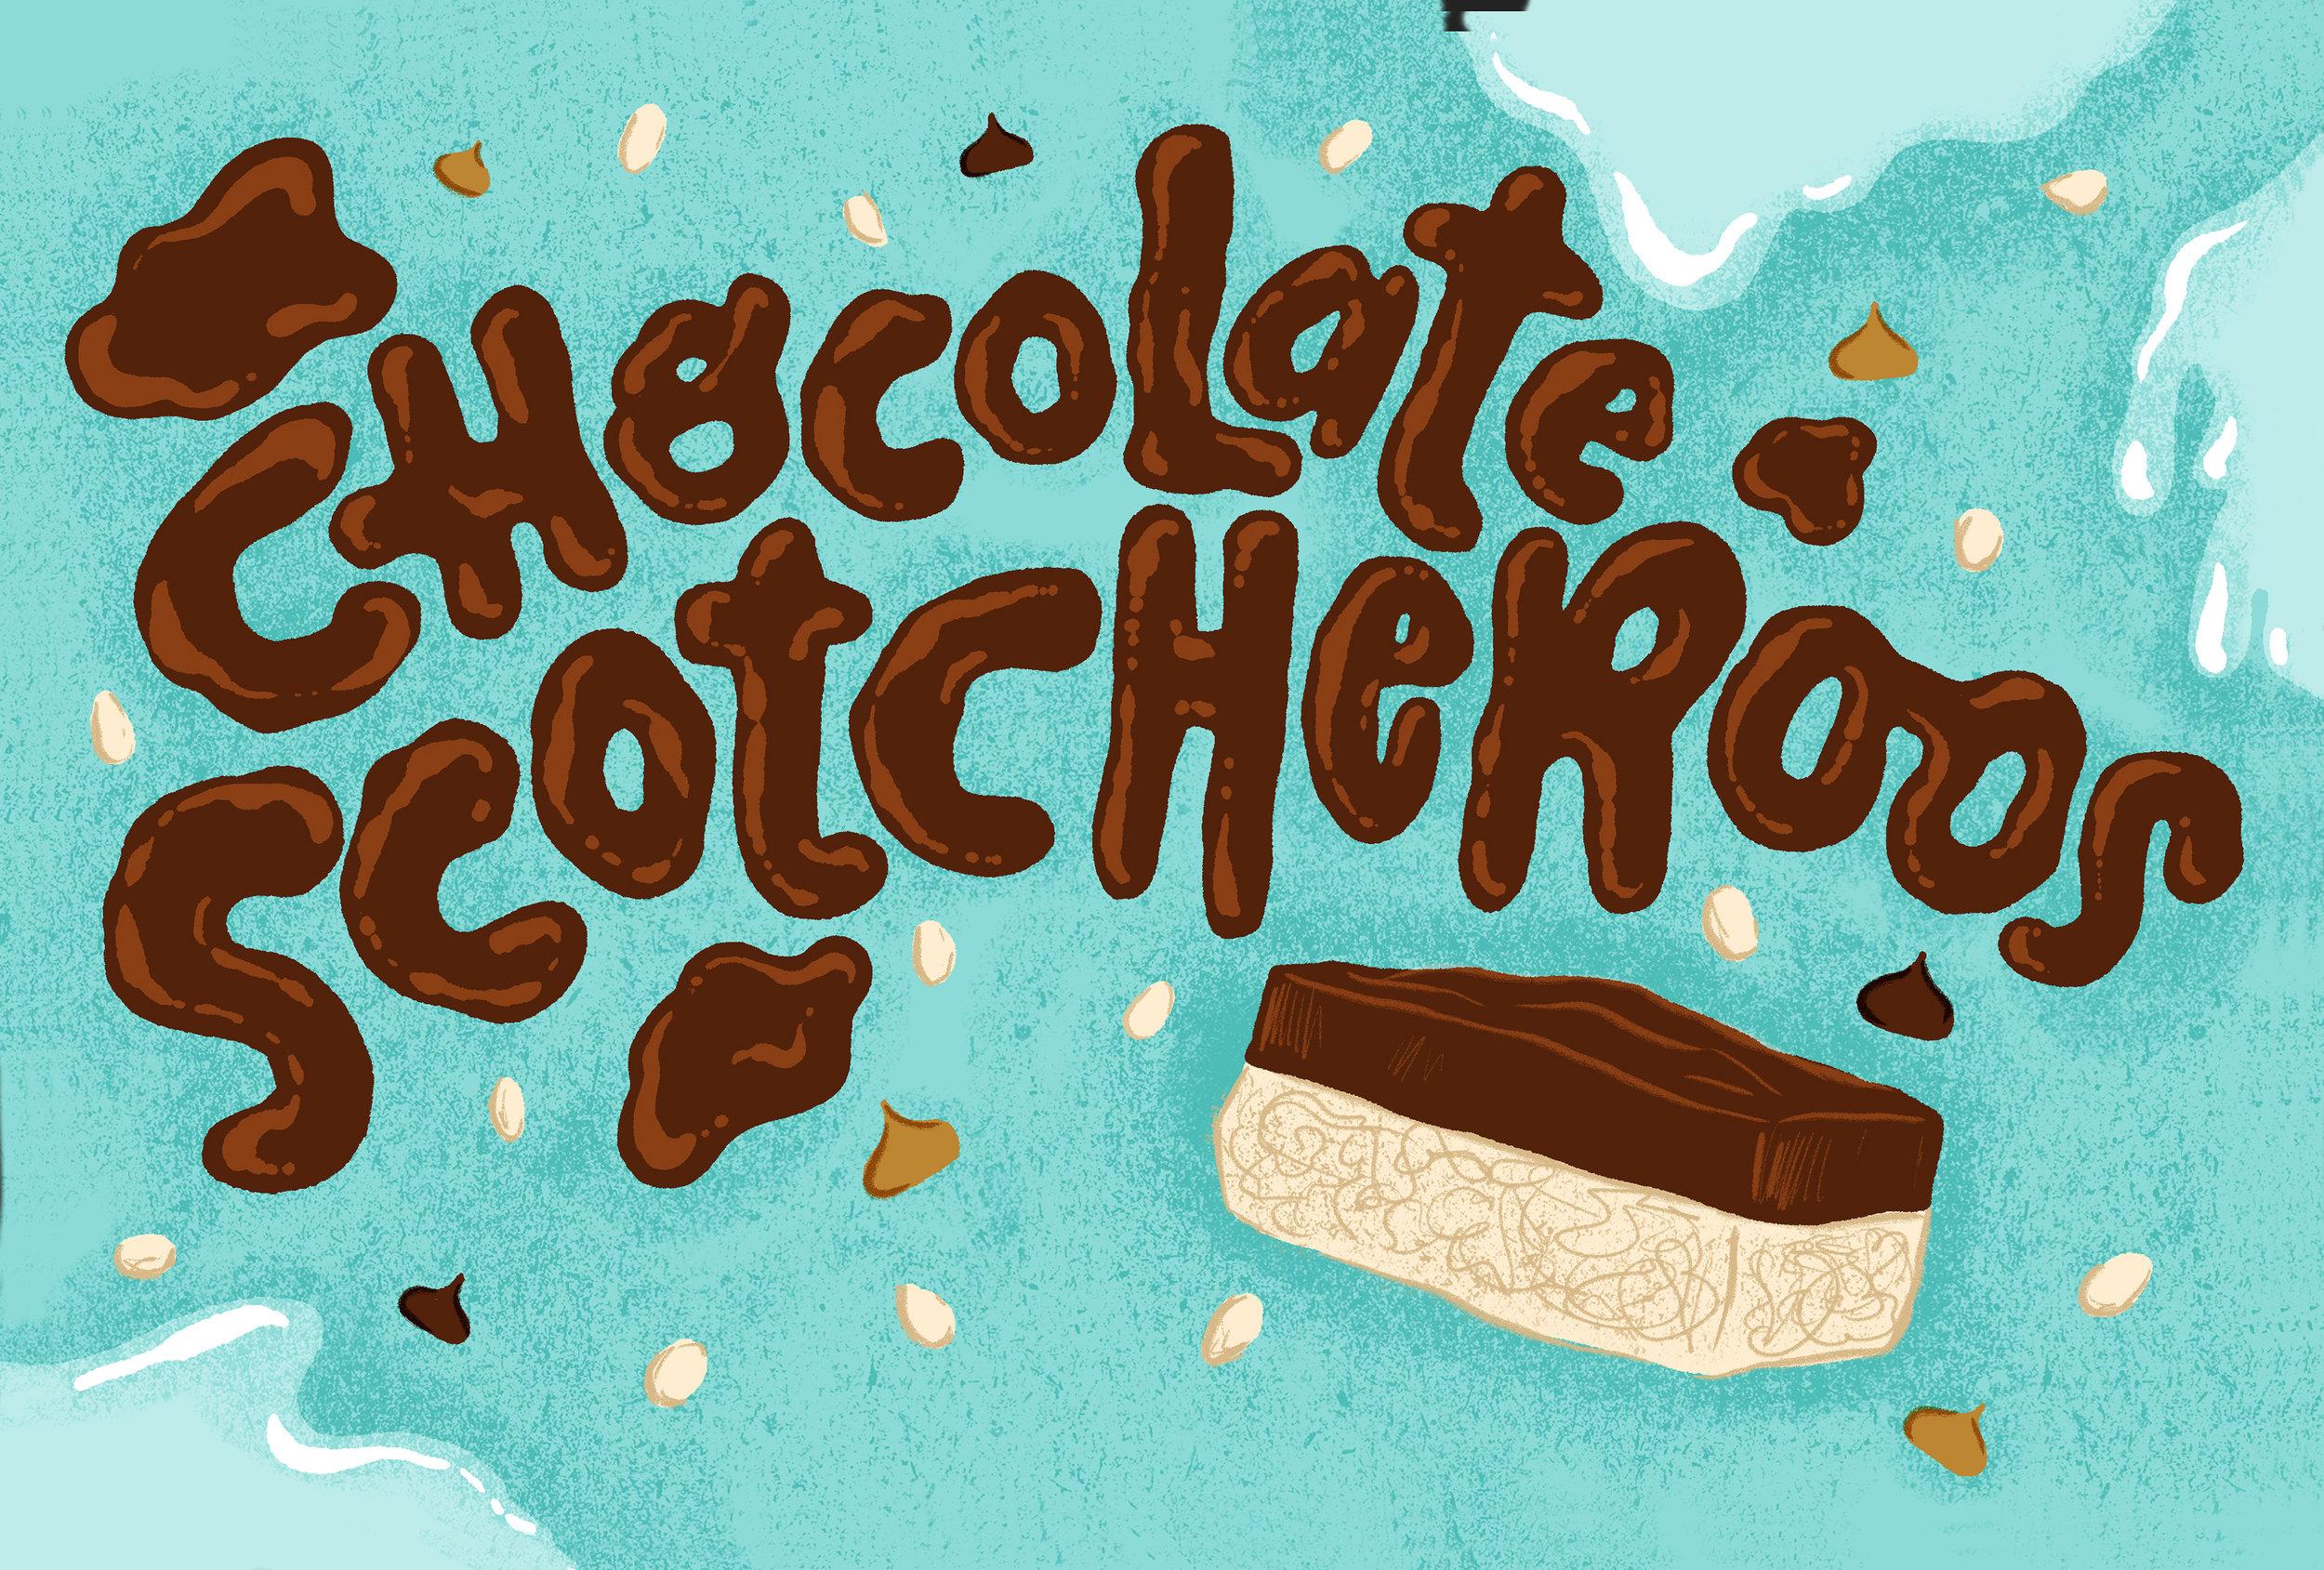 """Chocolate Scotcheroos"""